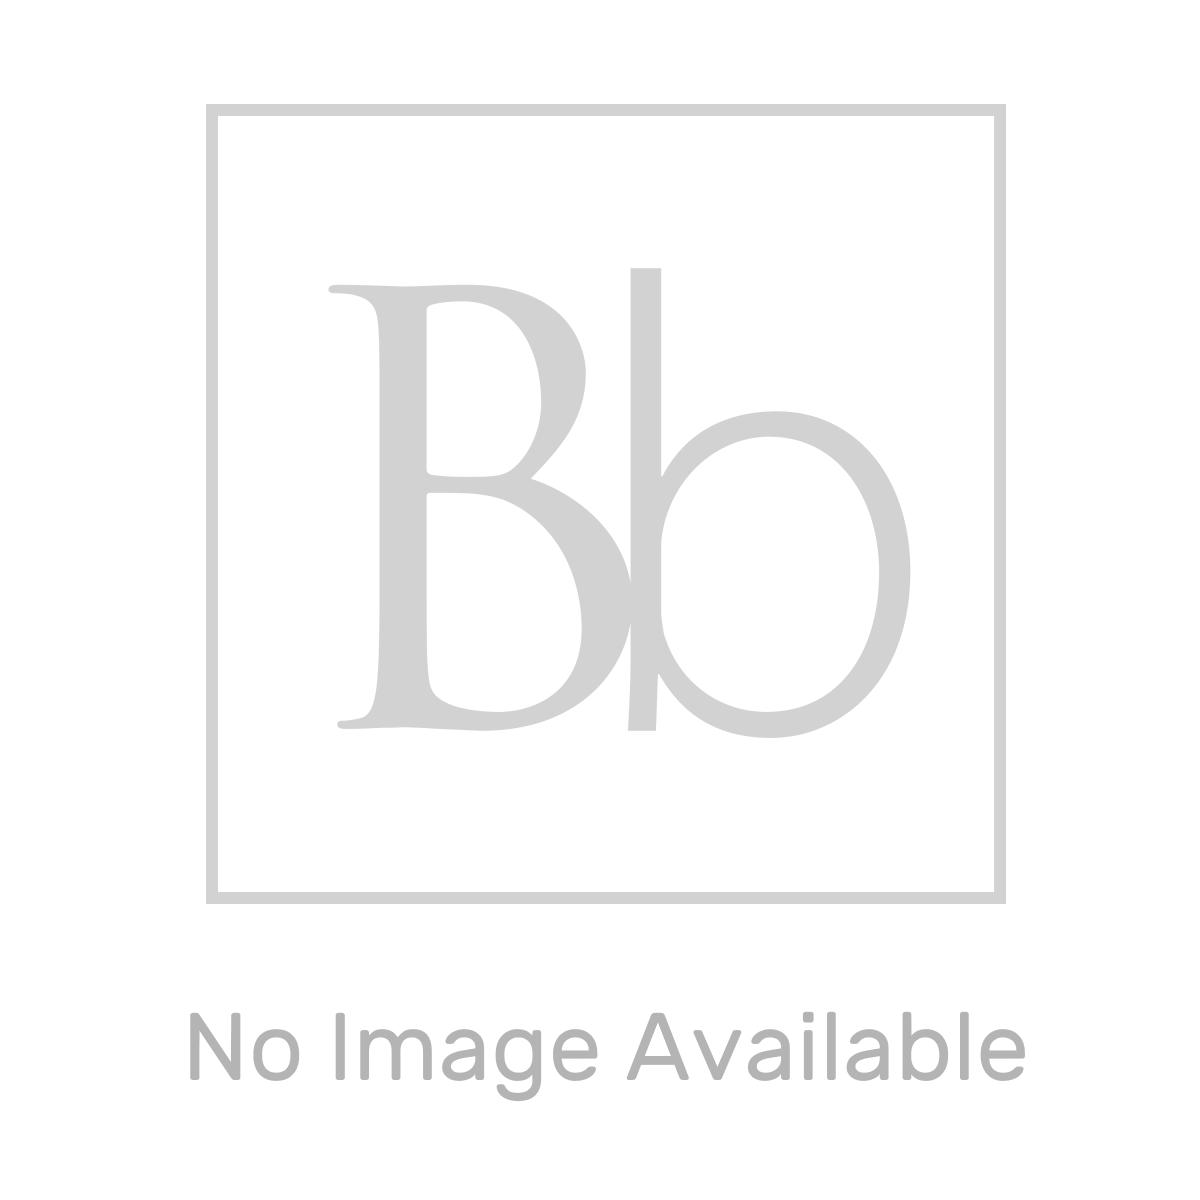 BTL Amyris White Wall Hung Toilet Line Drawing